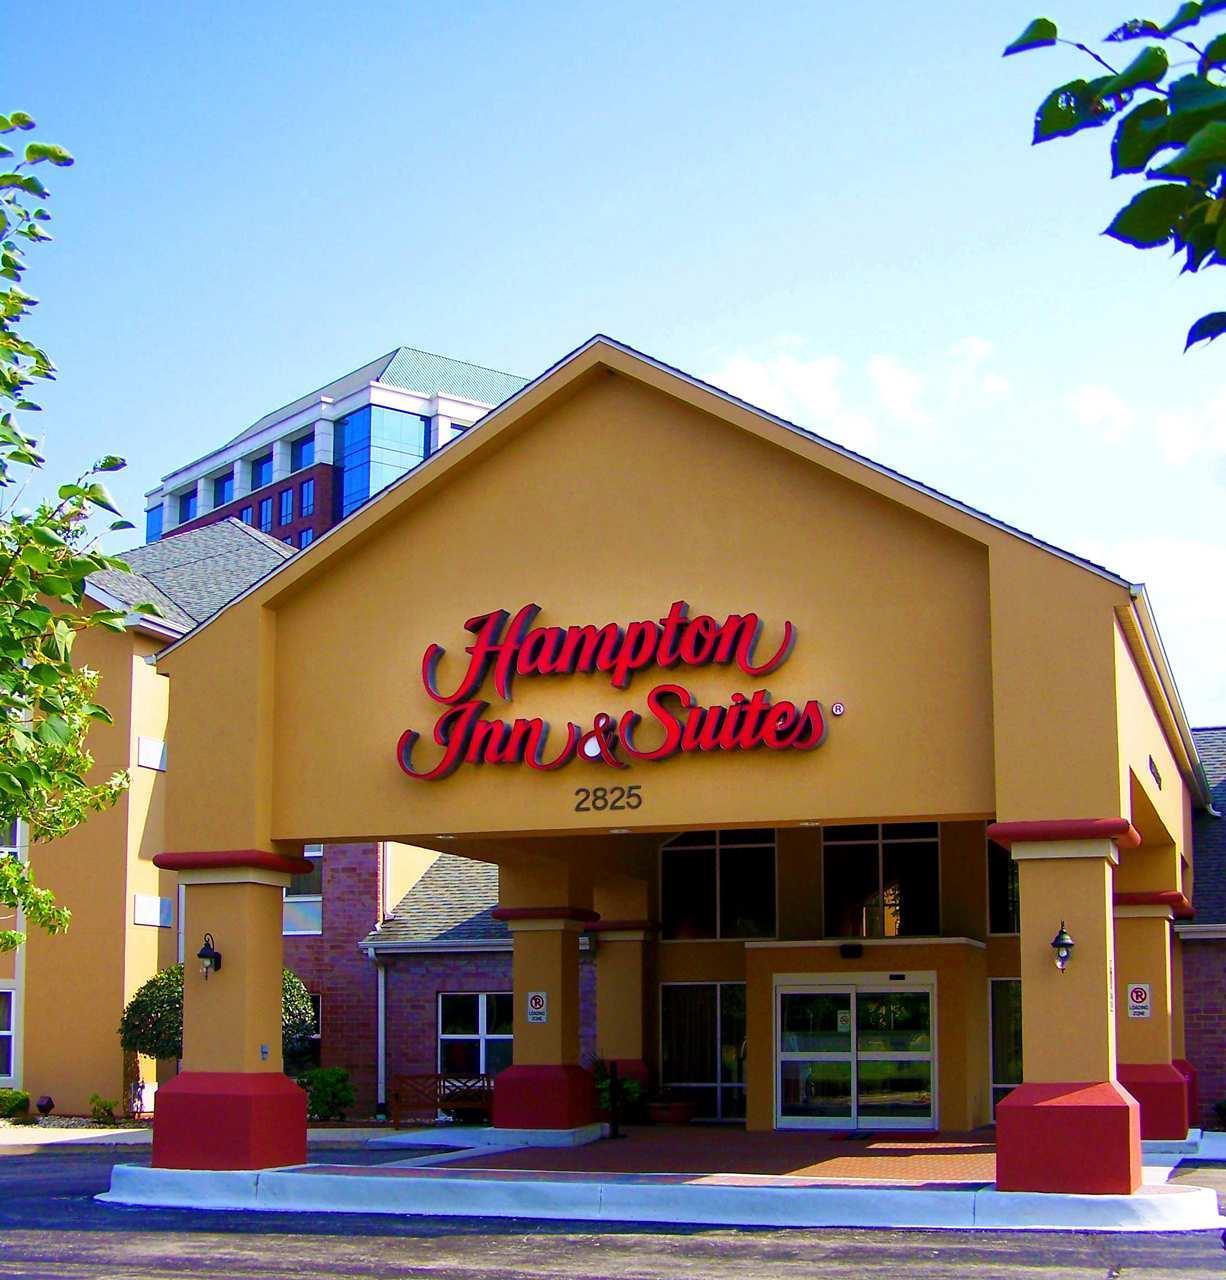 Hampton Inn & Suites Chicago/Hoffman Estates image 1